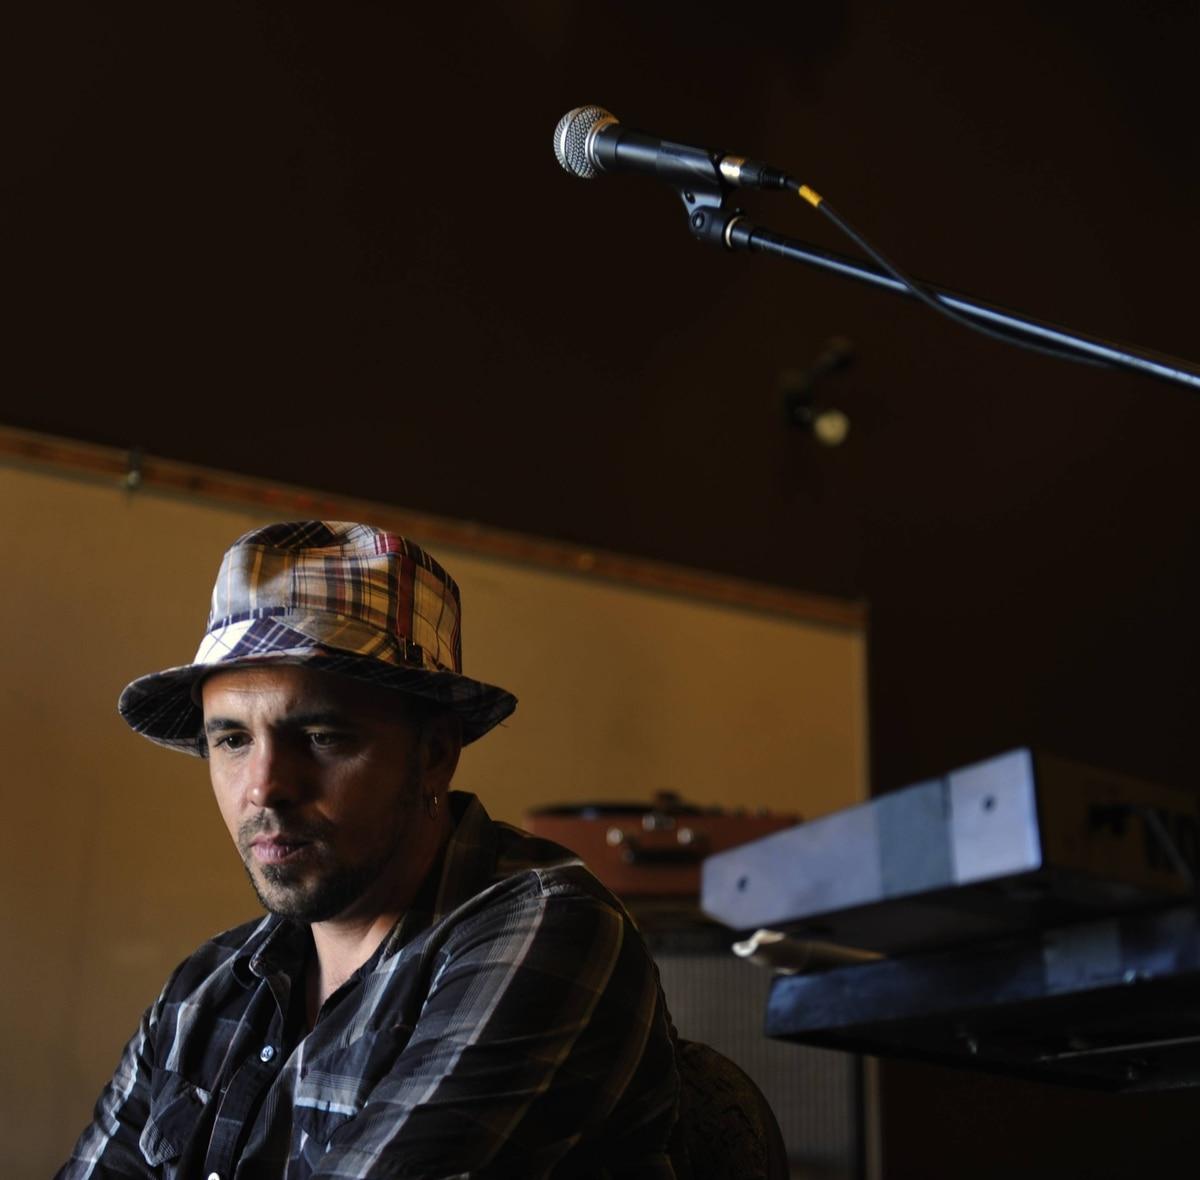 Singer/songwriter Hawksley Workman